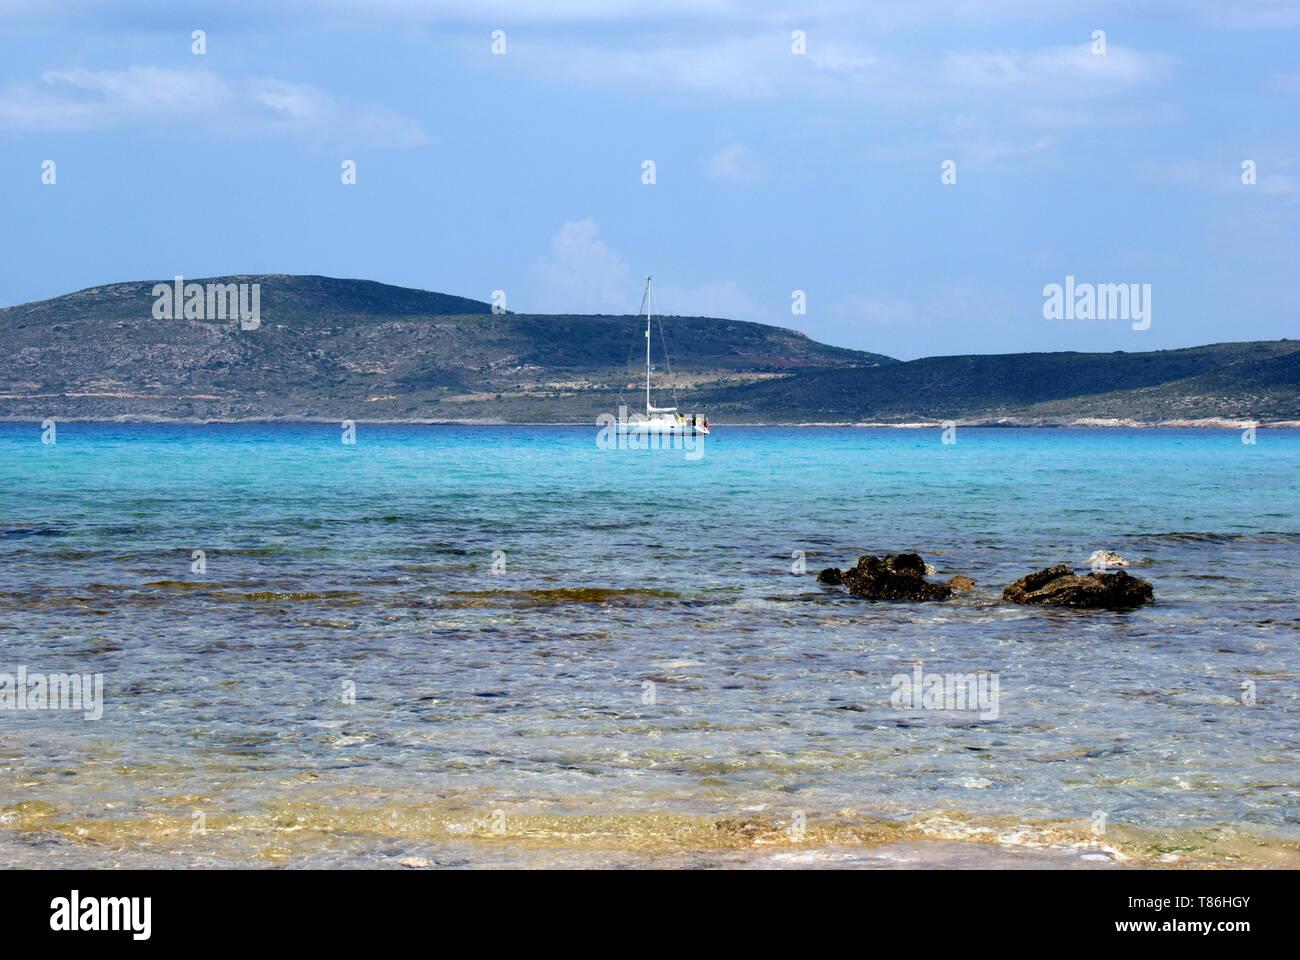 A sailing yacht anchored off Simos beach, Elafonisos island,    Laconia, Peloponnese, Greece - Stock Image